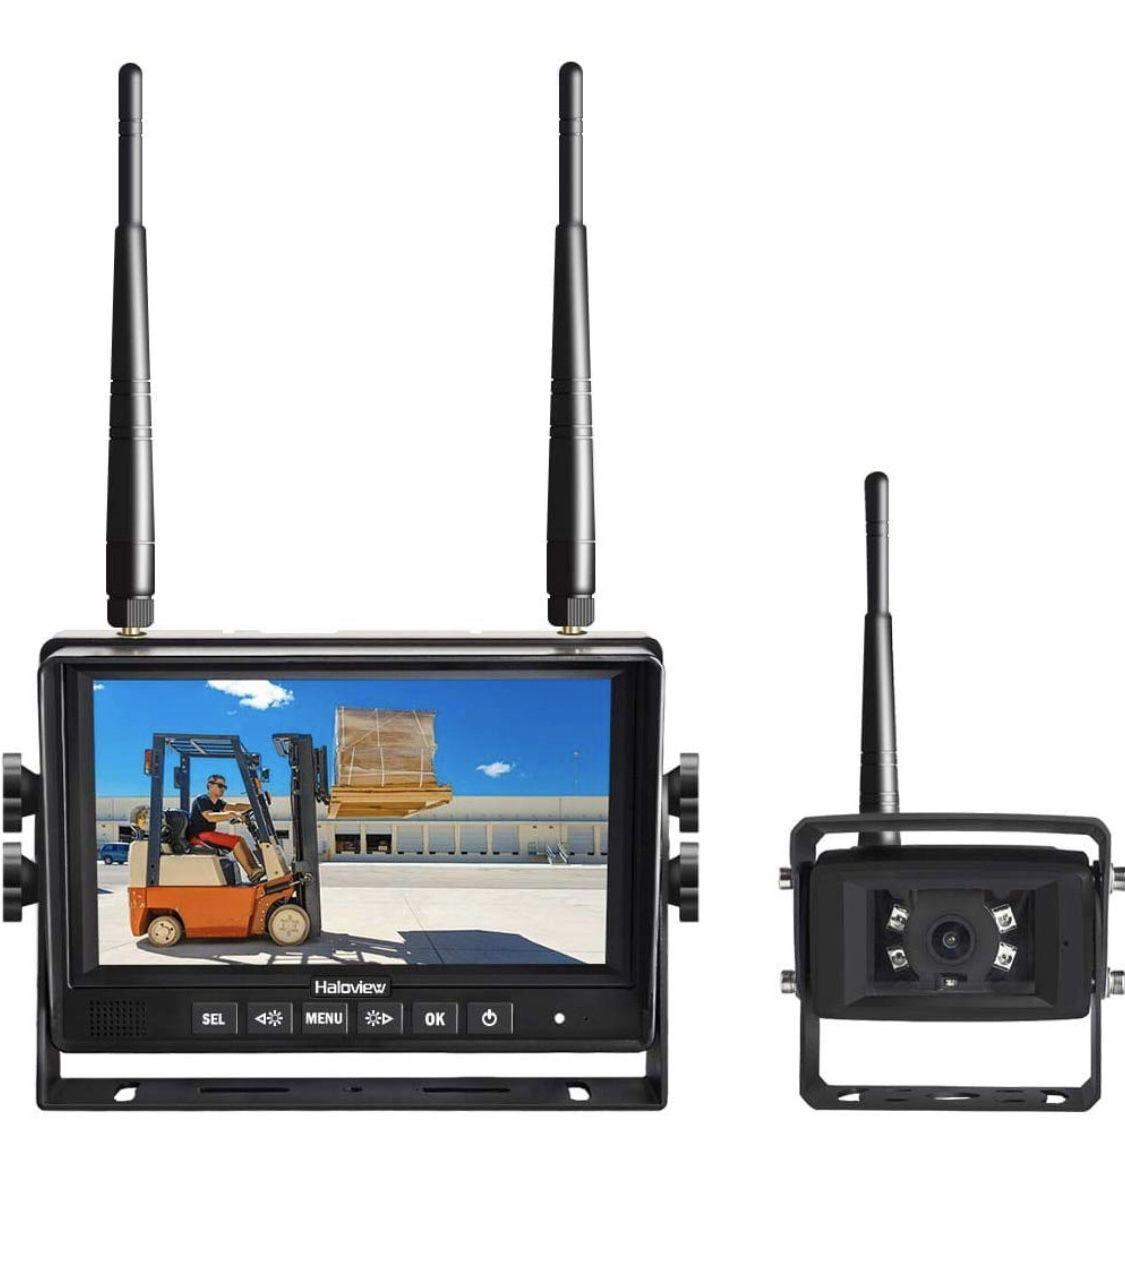 Haloview MC7101 Digital Wireless Backup Camera System Kit 7'' LCD Reversing Monitor and IP69K Waterproof Rear View Camera Built in DVR For Truck/Trai